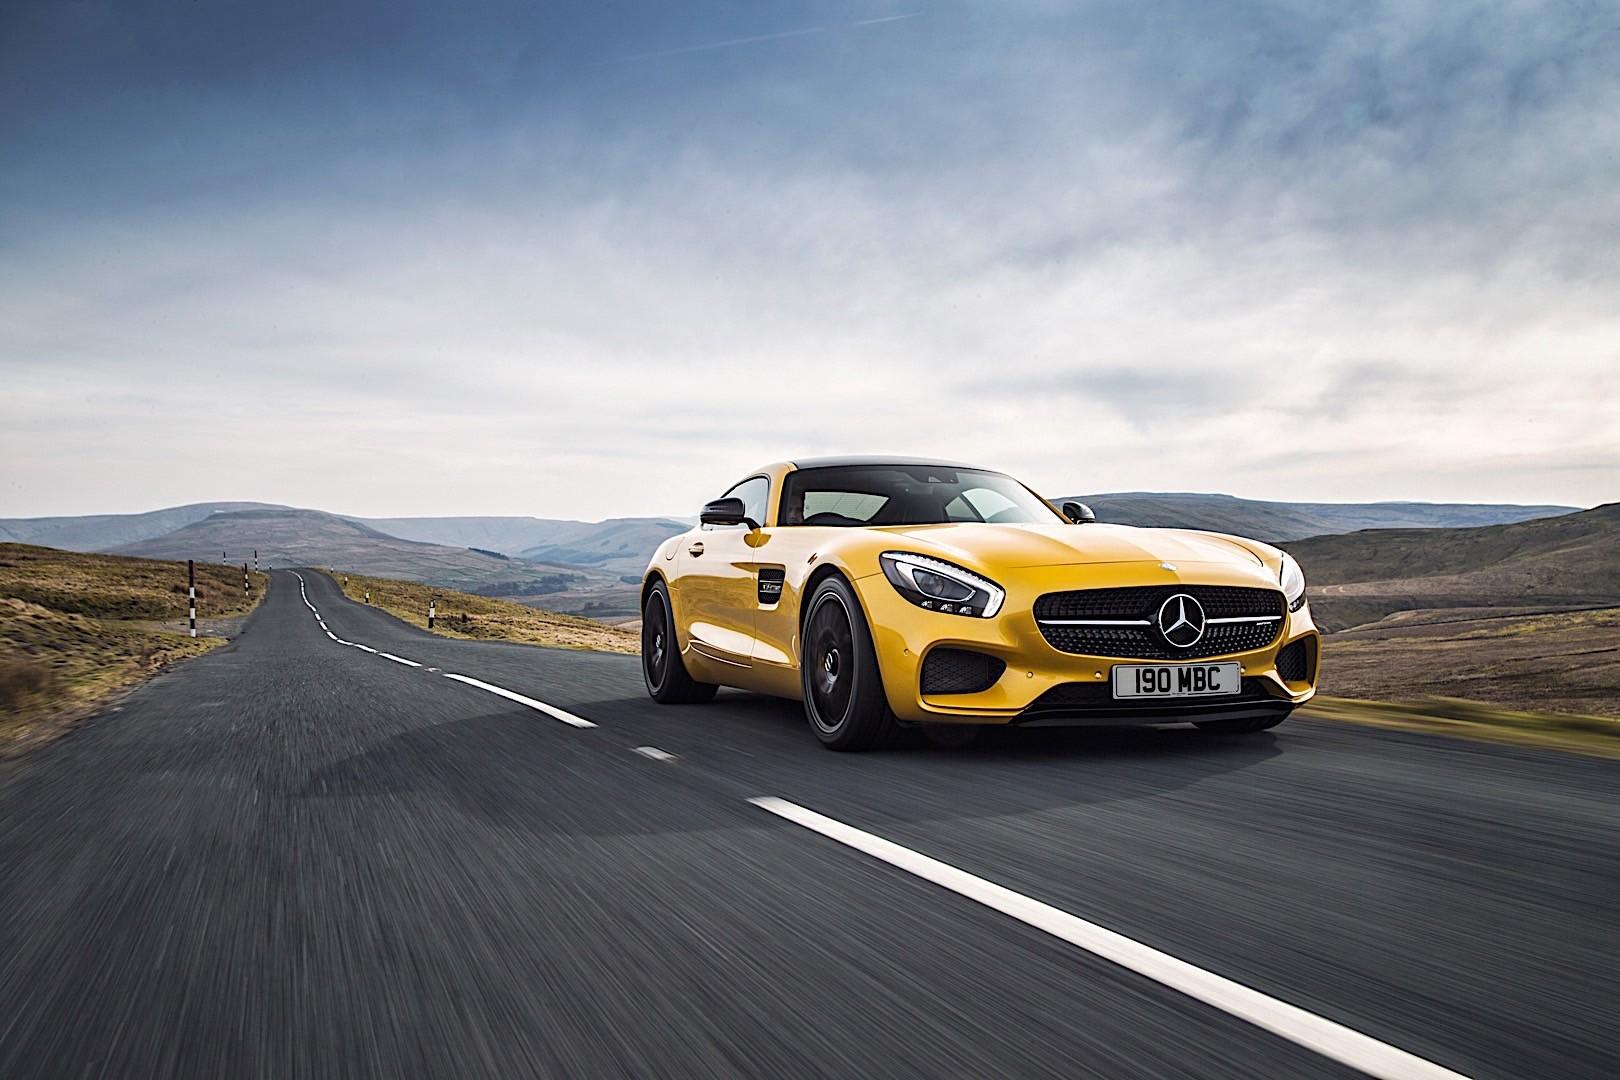 Mercedes amg gt s c190 specs 2015 2016 2017 for 2015 mercedes benz amg gt